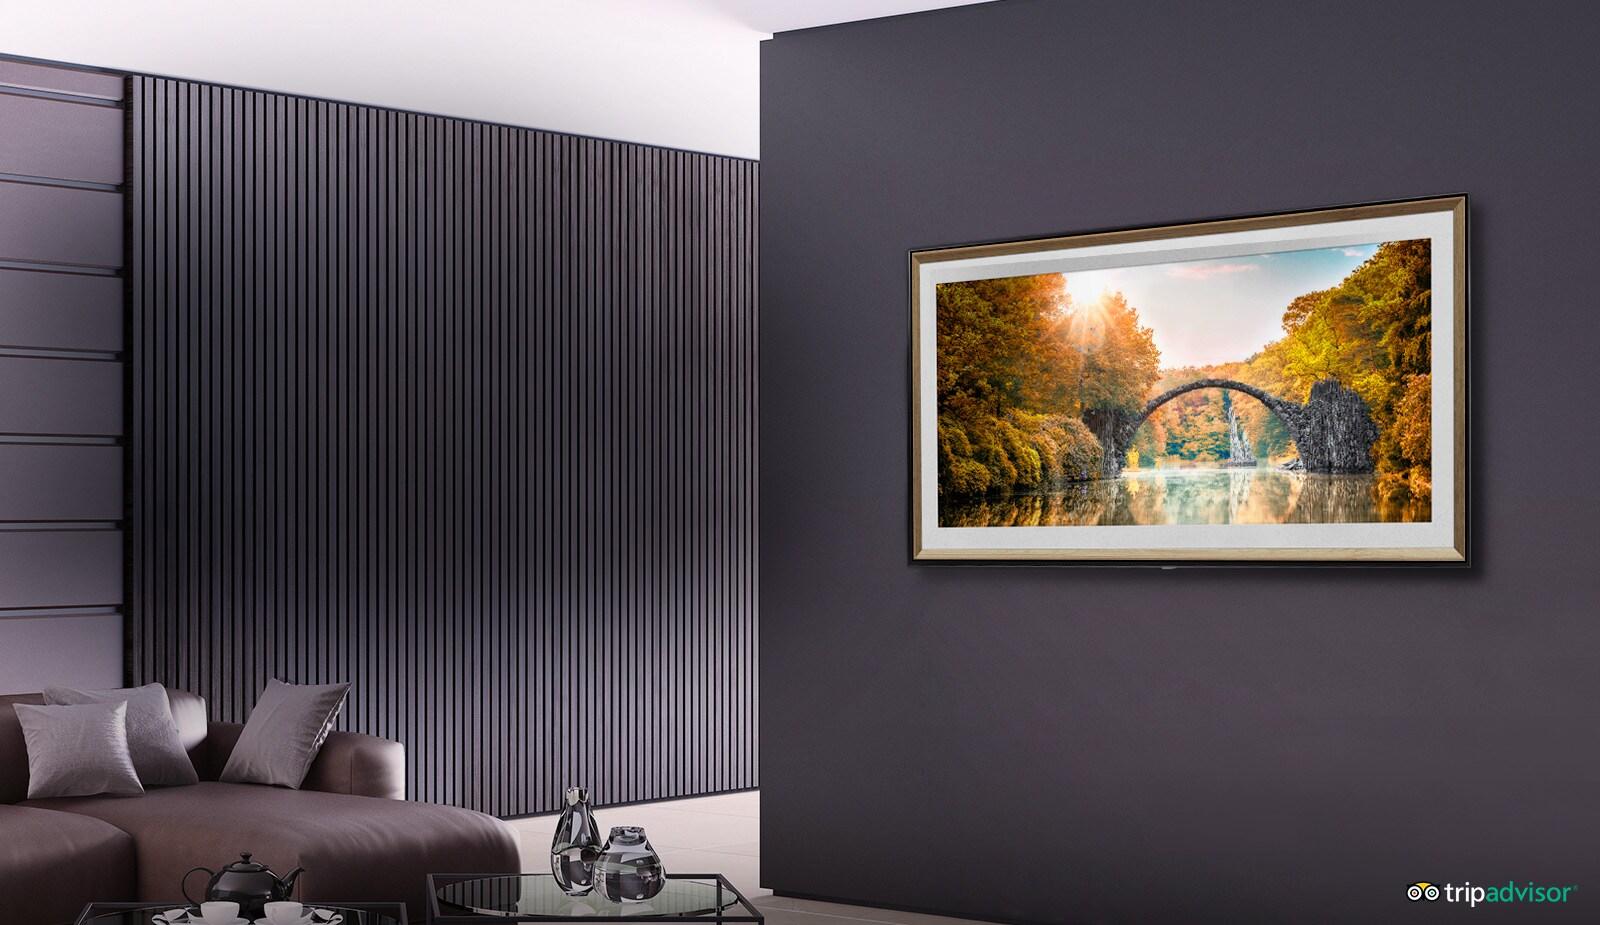 TV-NanoCell-SM85-10-Gallery-Mode-Desktop